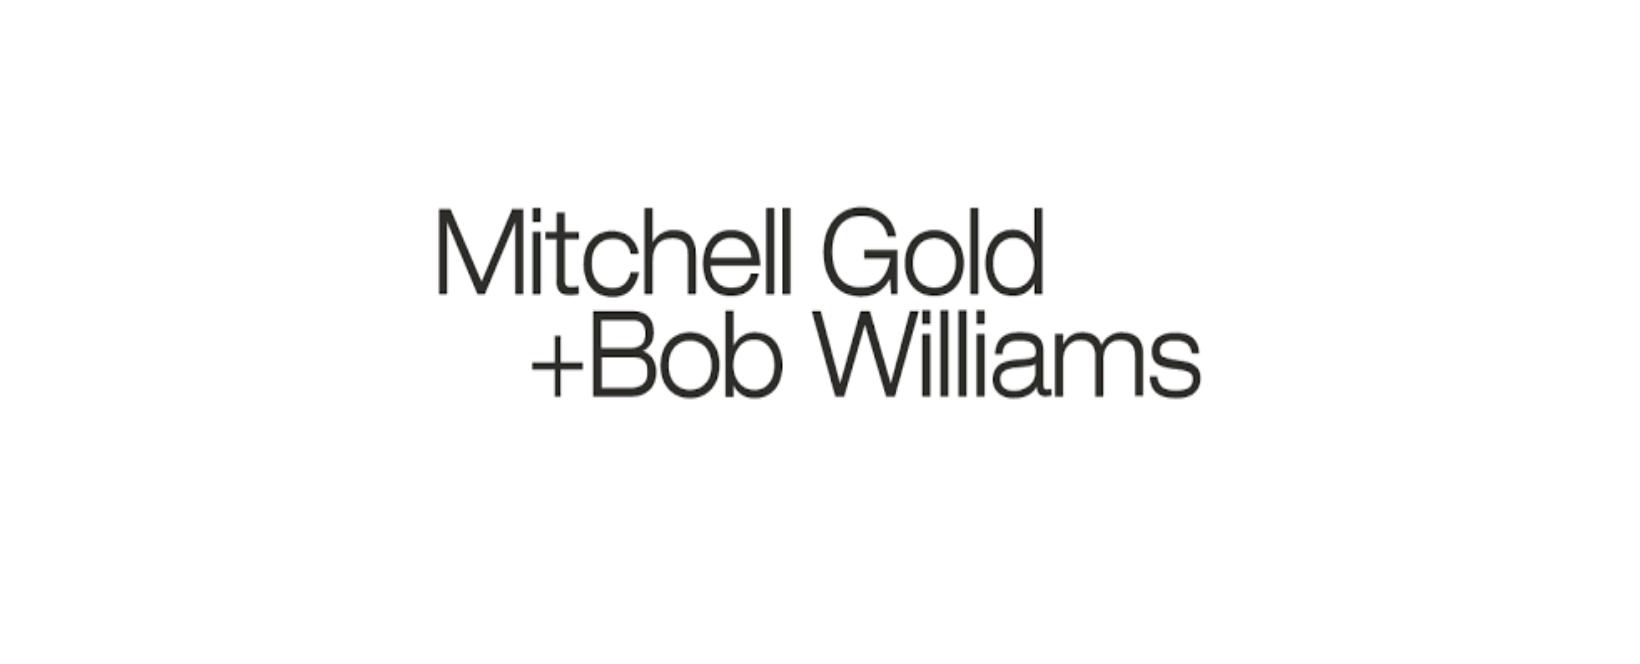 Mitchell Gold + Bob Williams Discount Code 2021